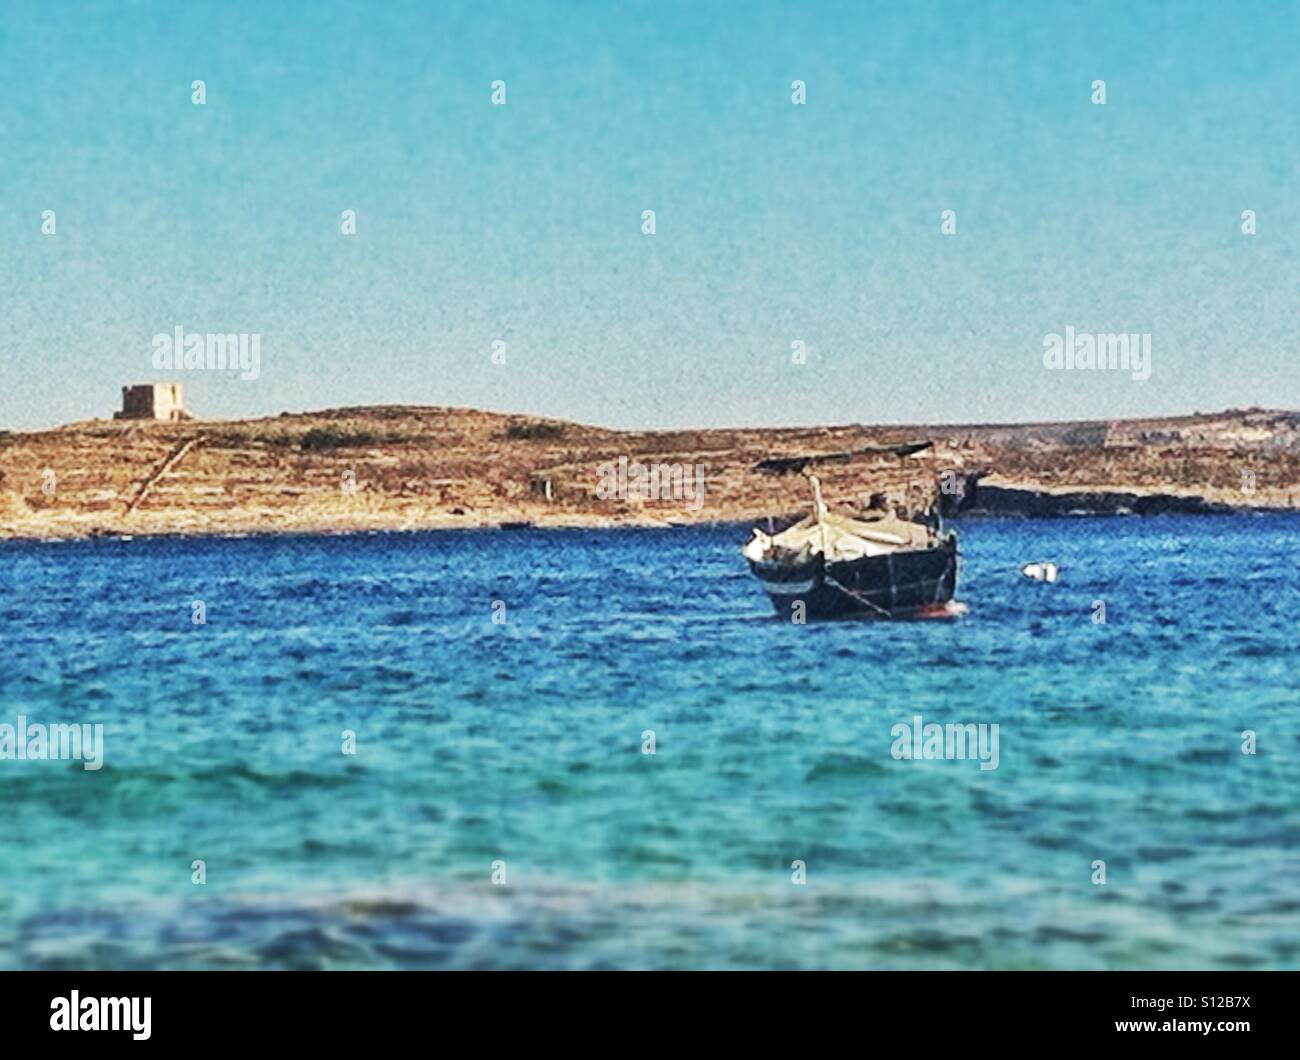 Balmy Days - Stock Image